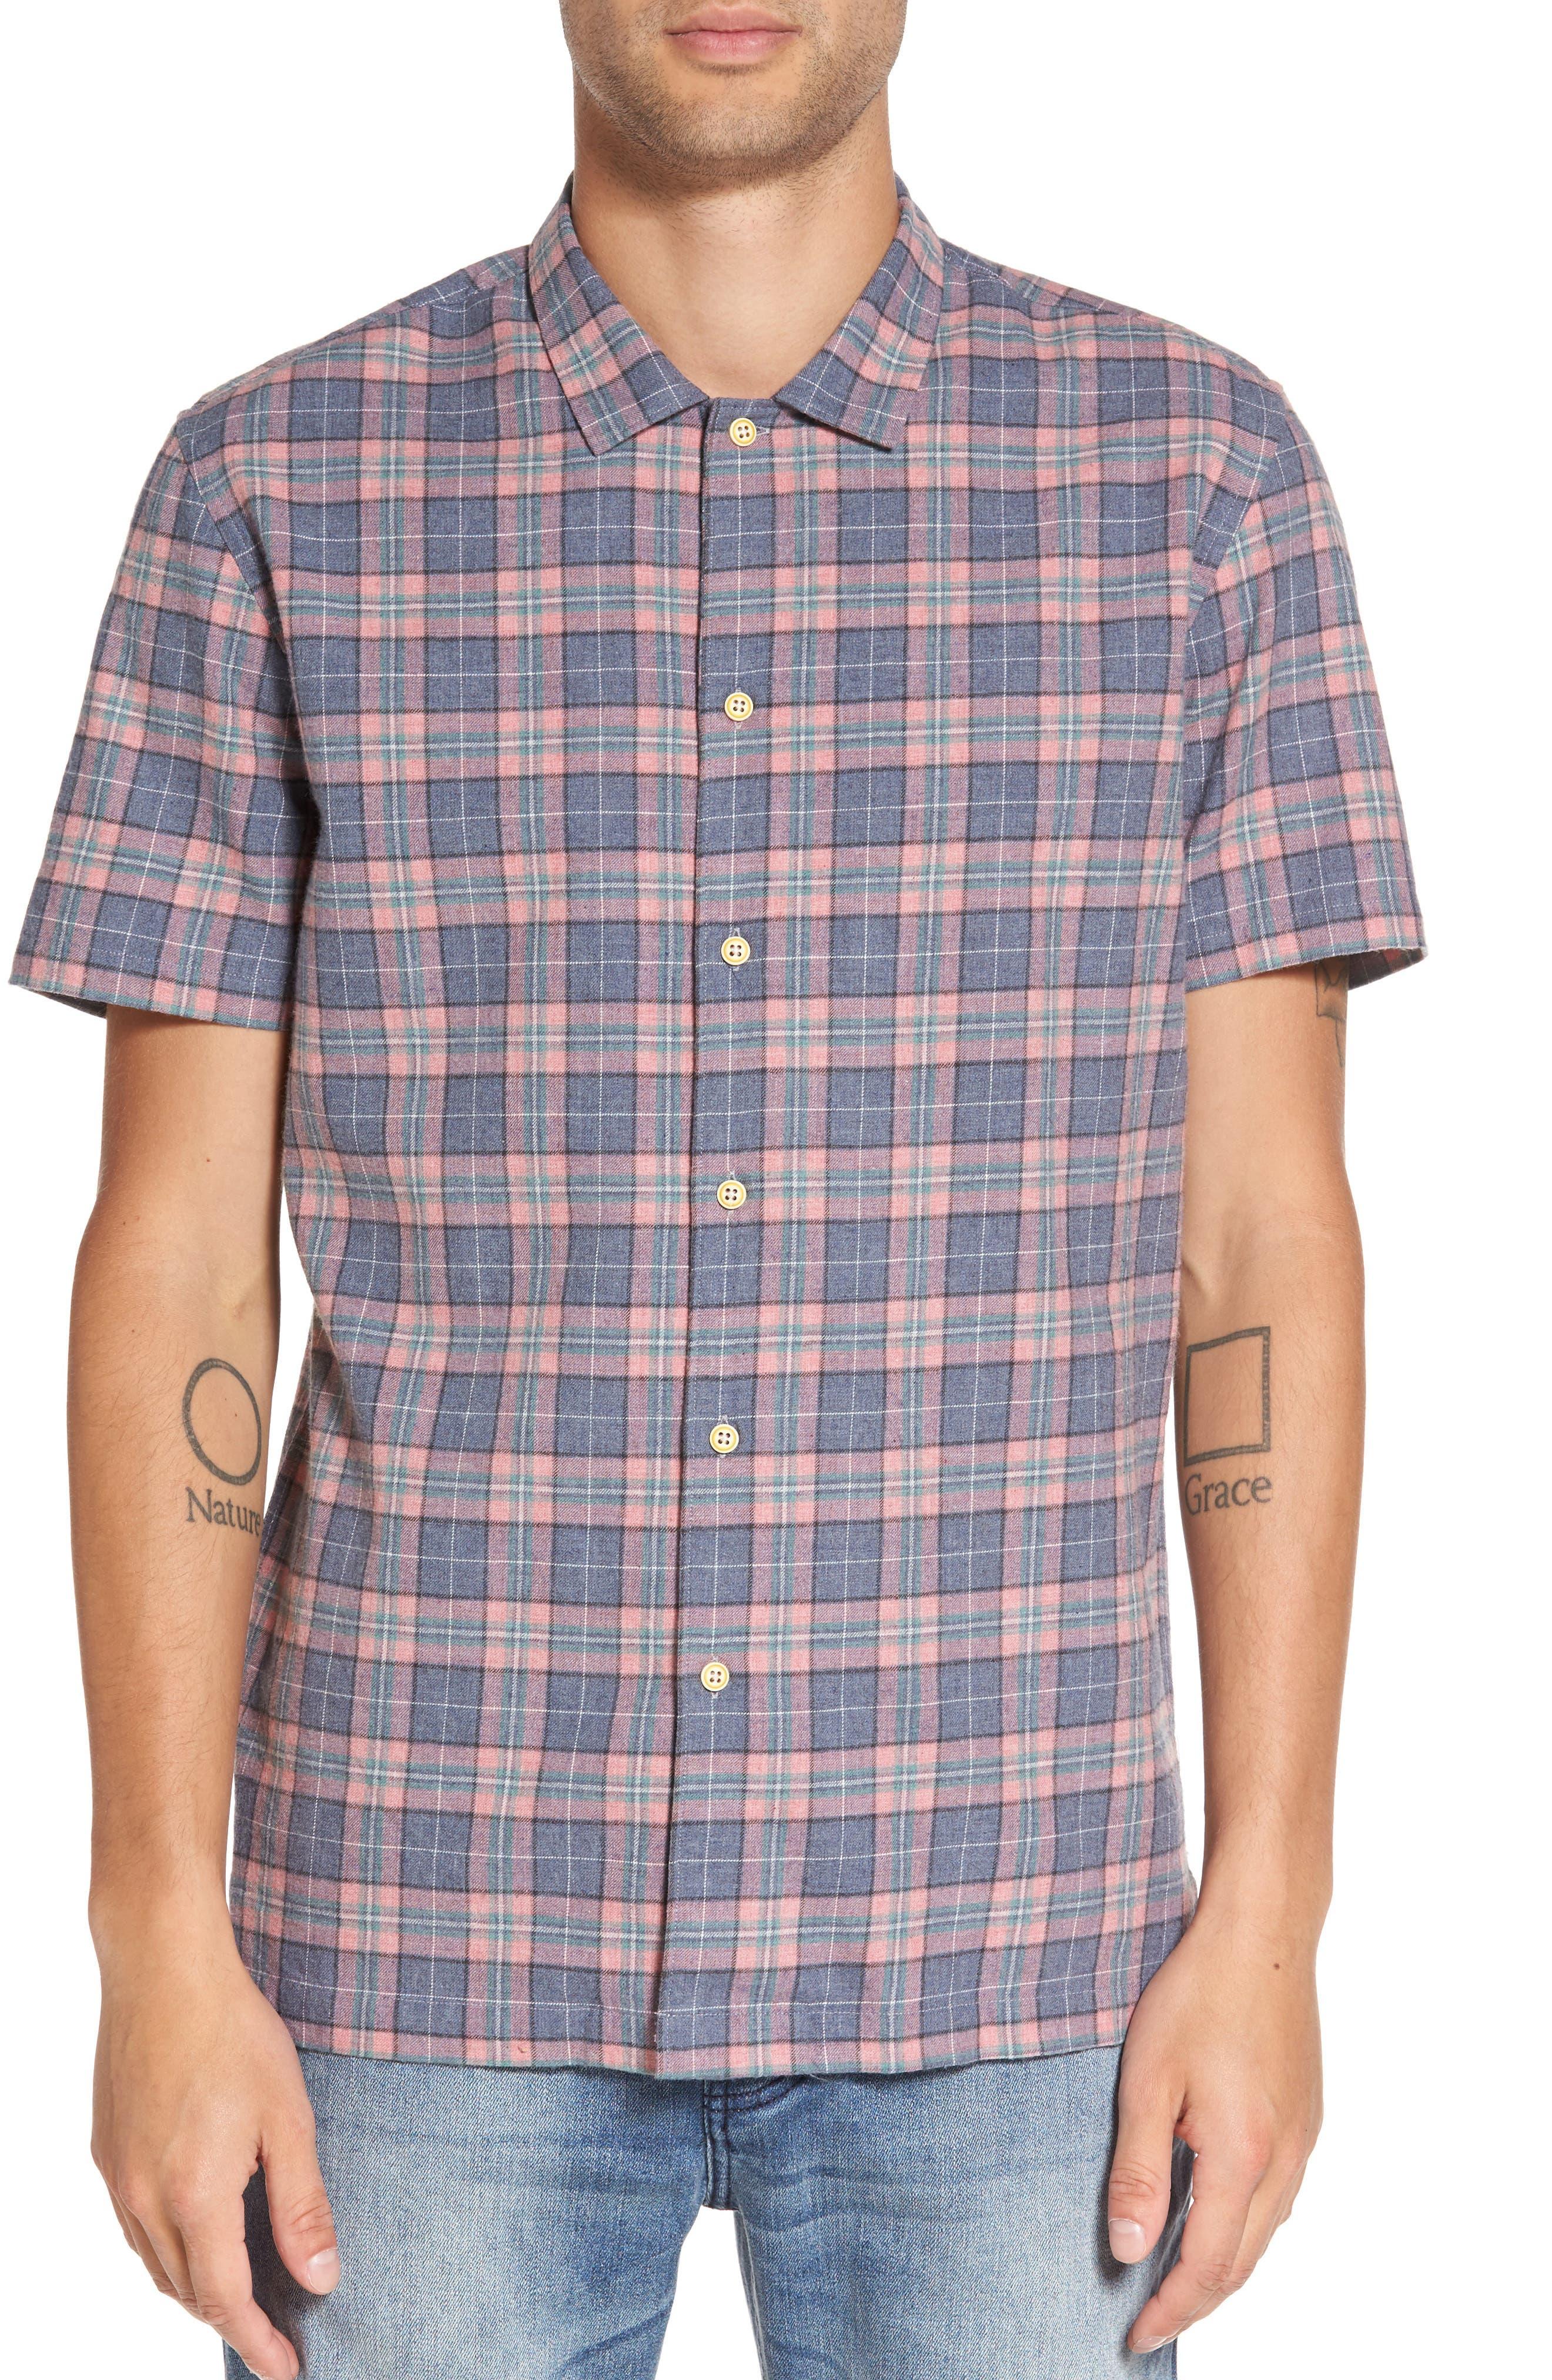 Florida Short Sleeve Plaid Shirt,                         Main,                         color, Pink/ Blue Plaid